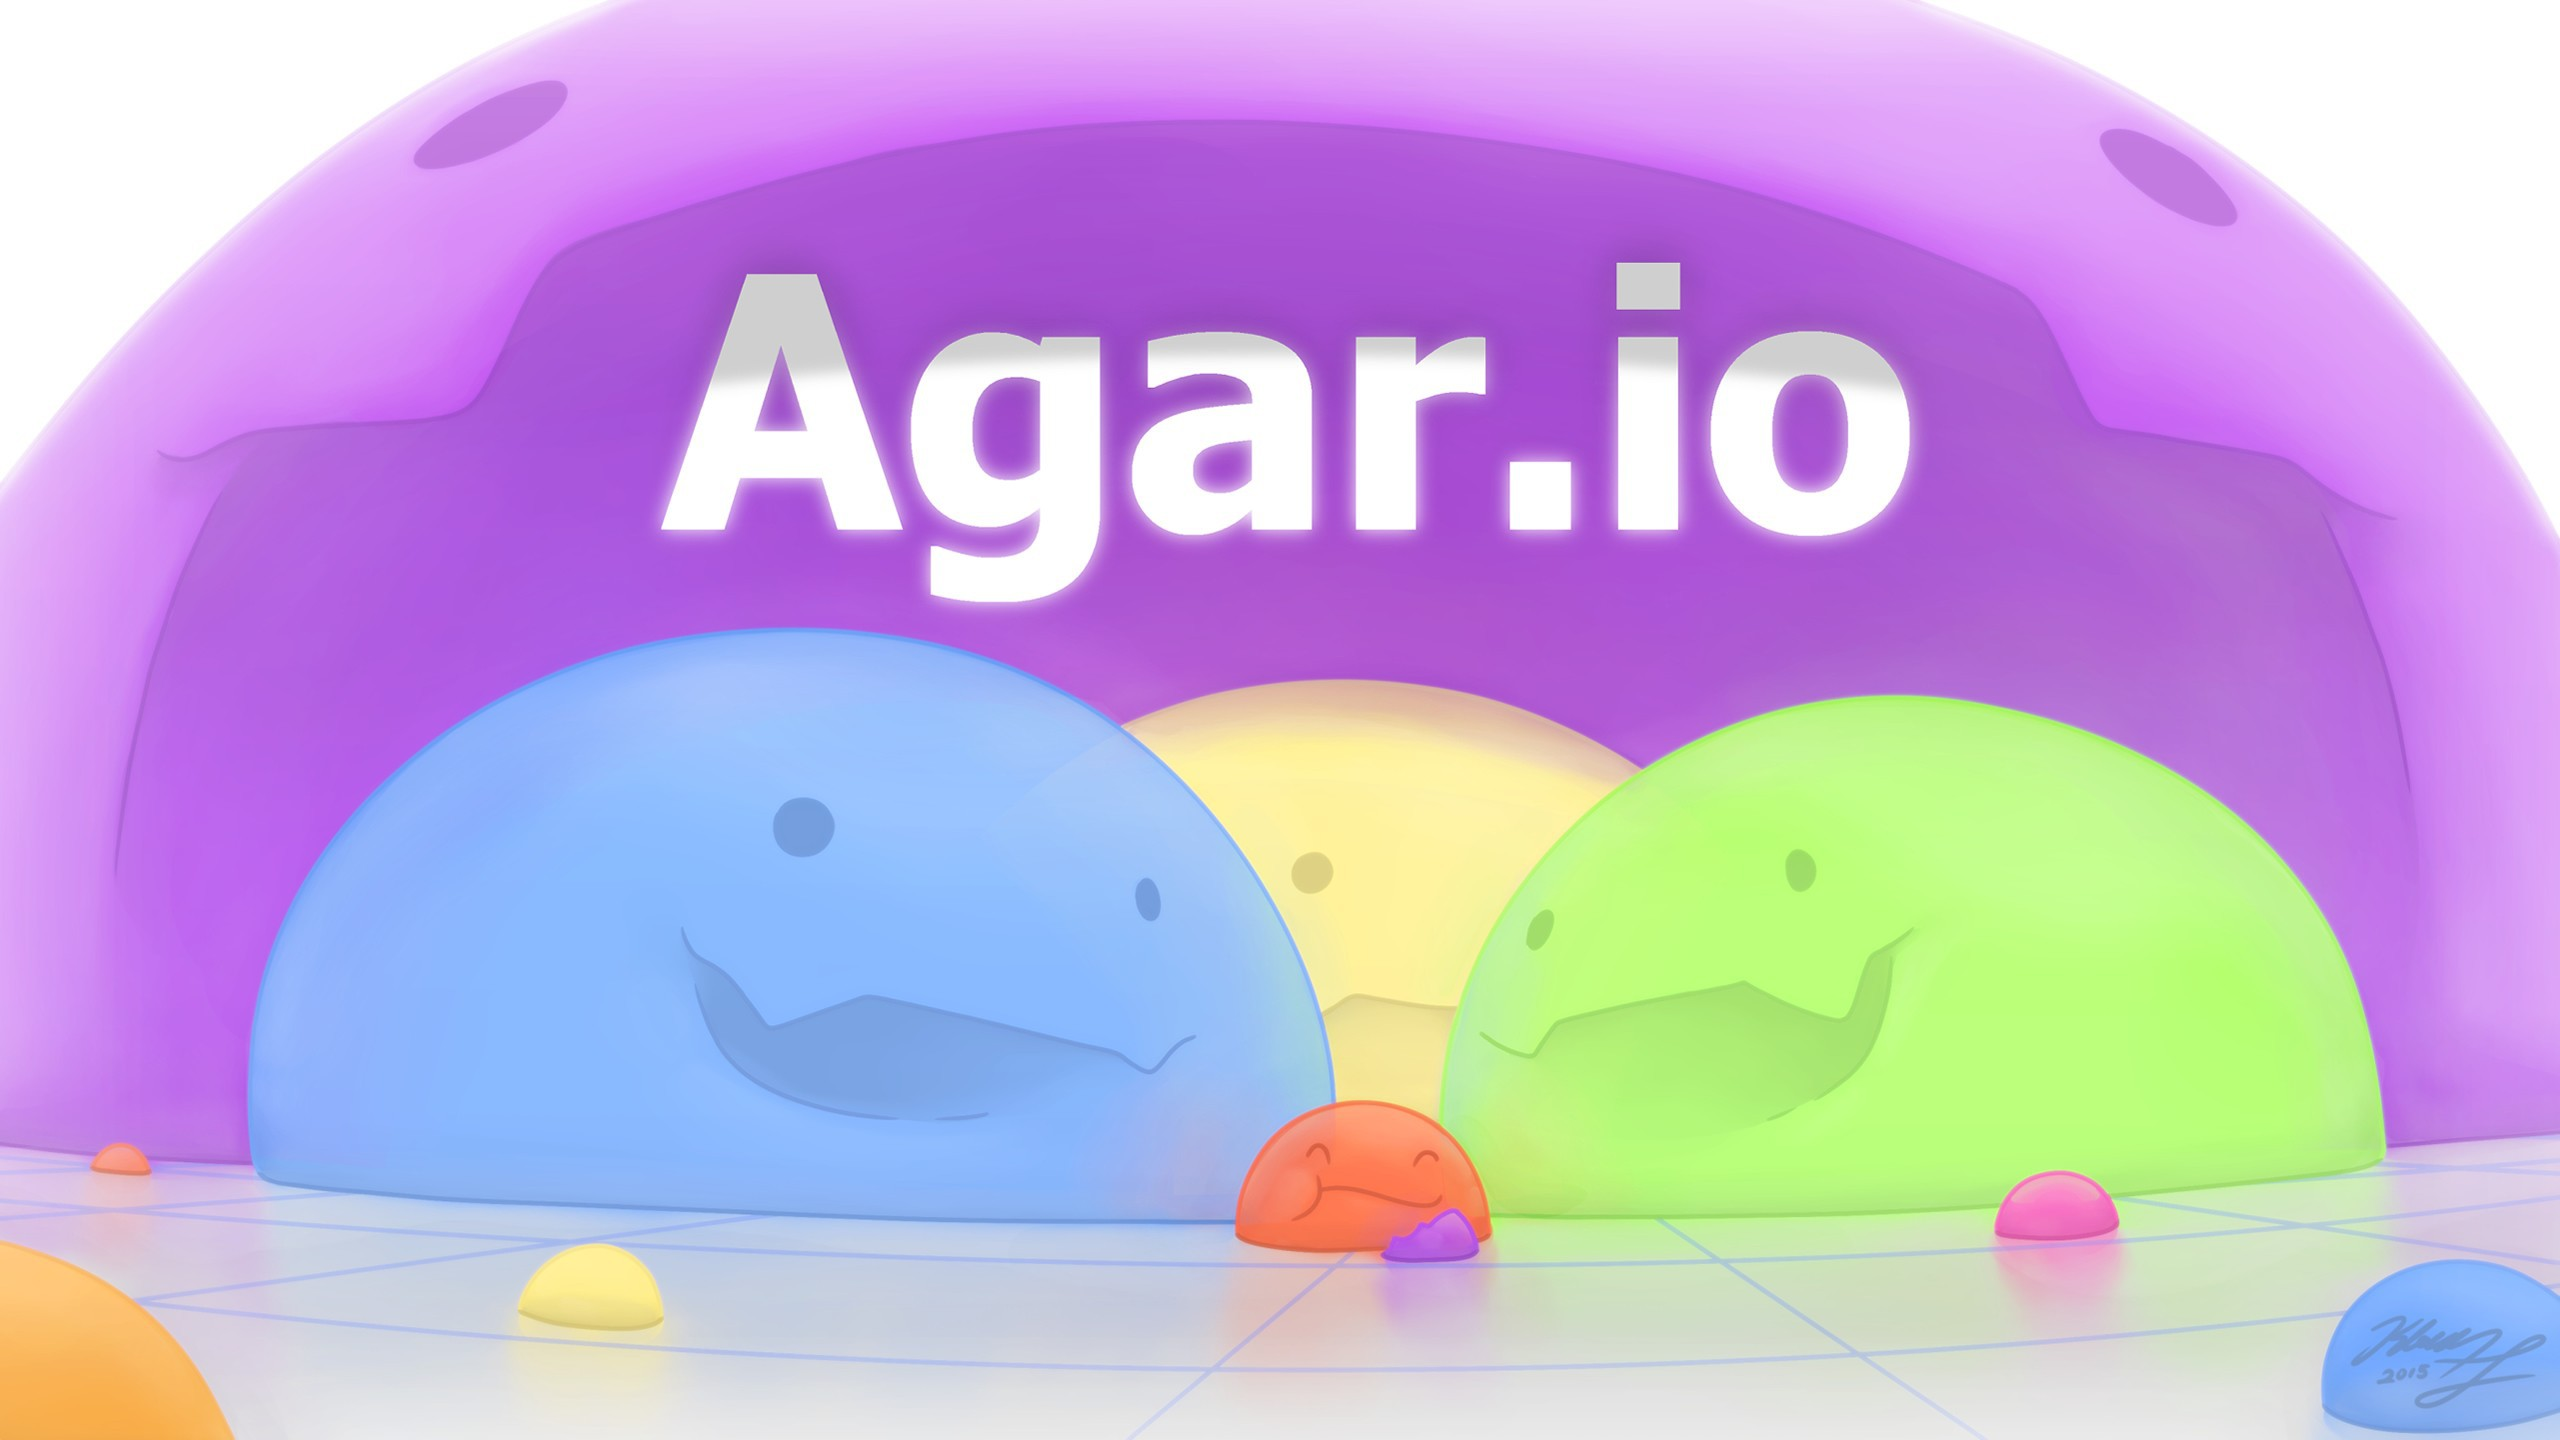 agar.bio Skin Adları - Agar.io Play, agario pvp server ...